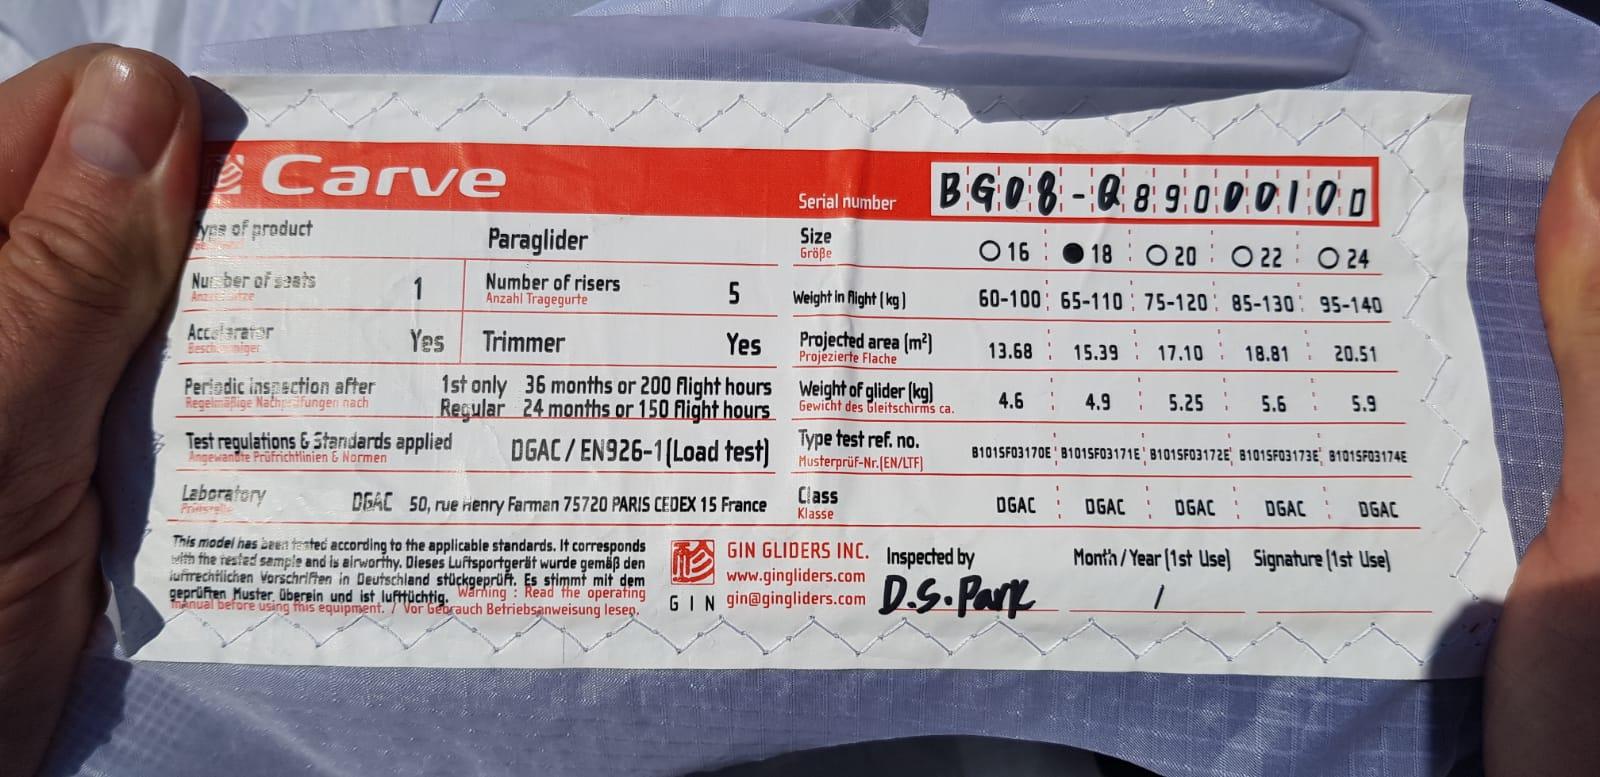 Gin Carve freestyle glider